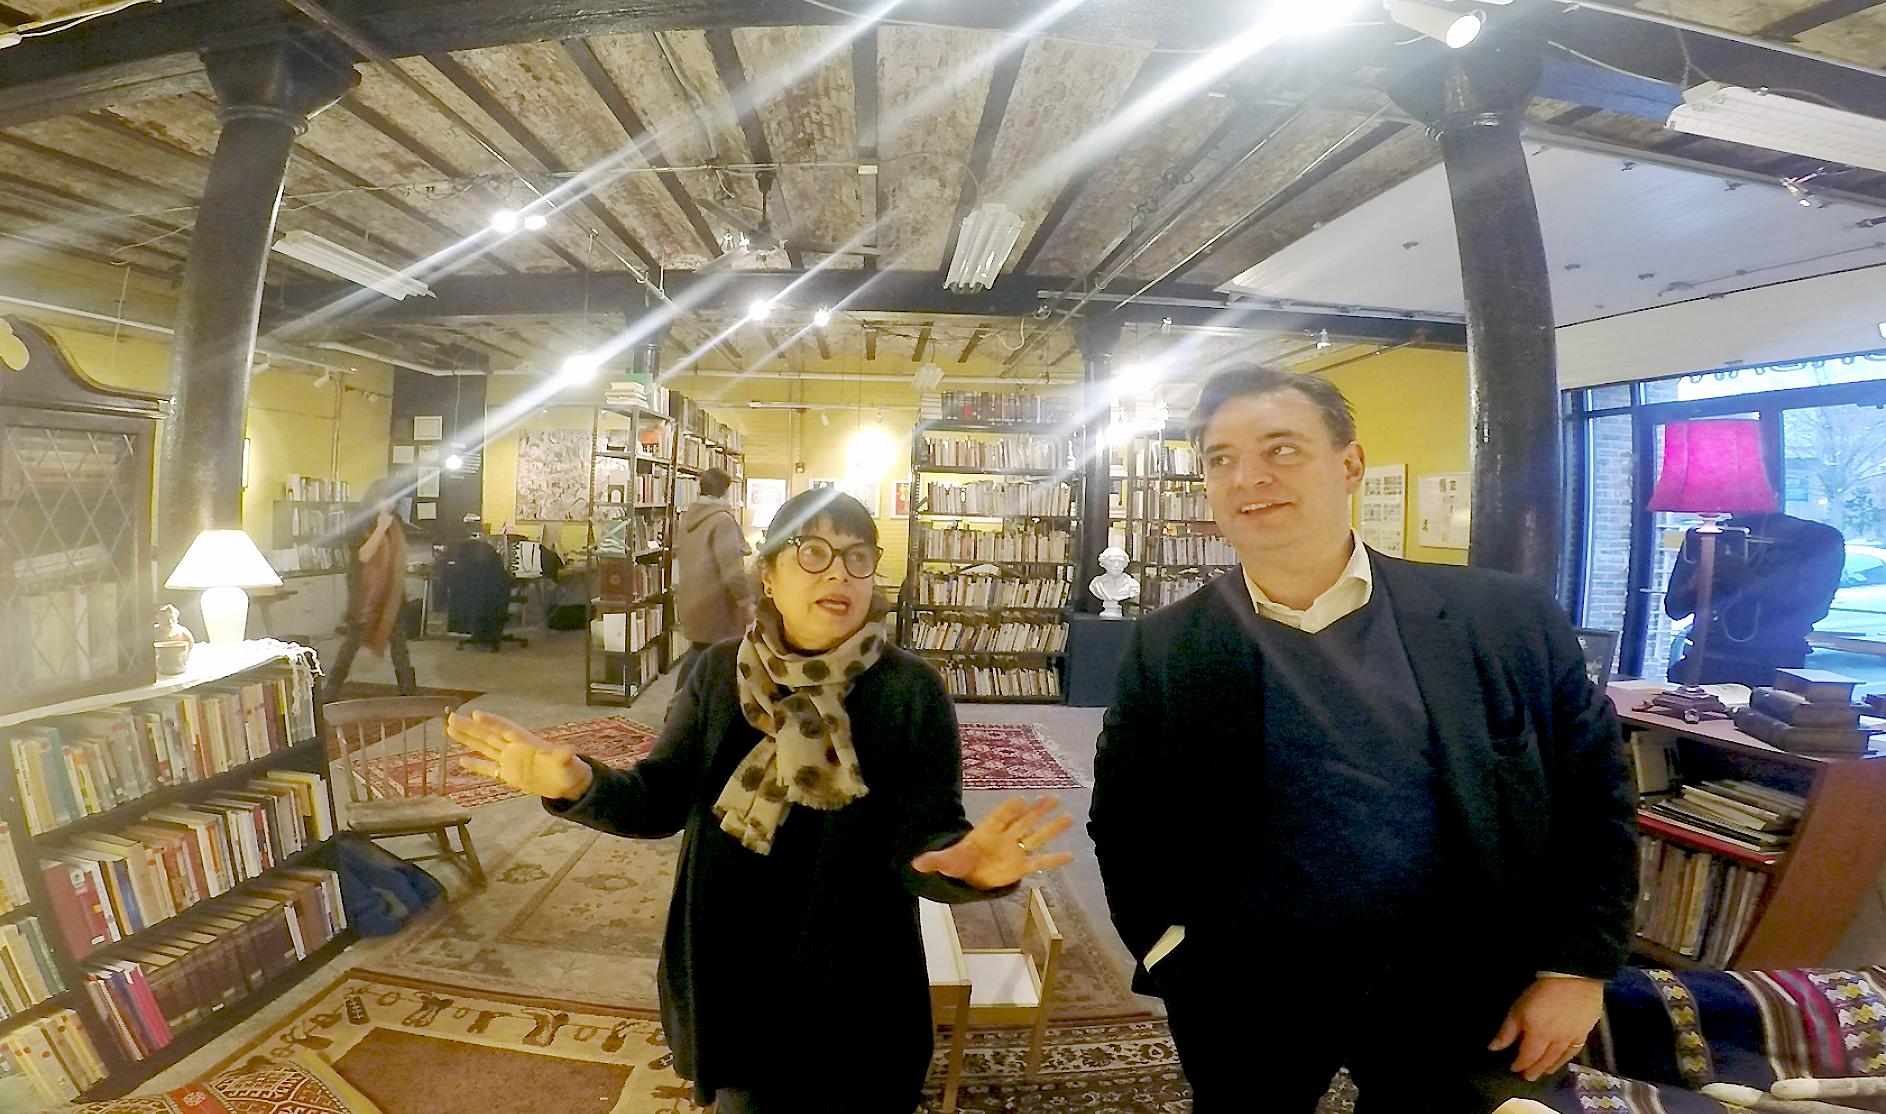 Stella and Pablo view the walls of Librería Donceles.